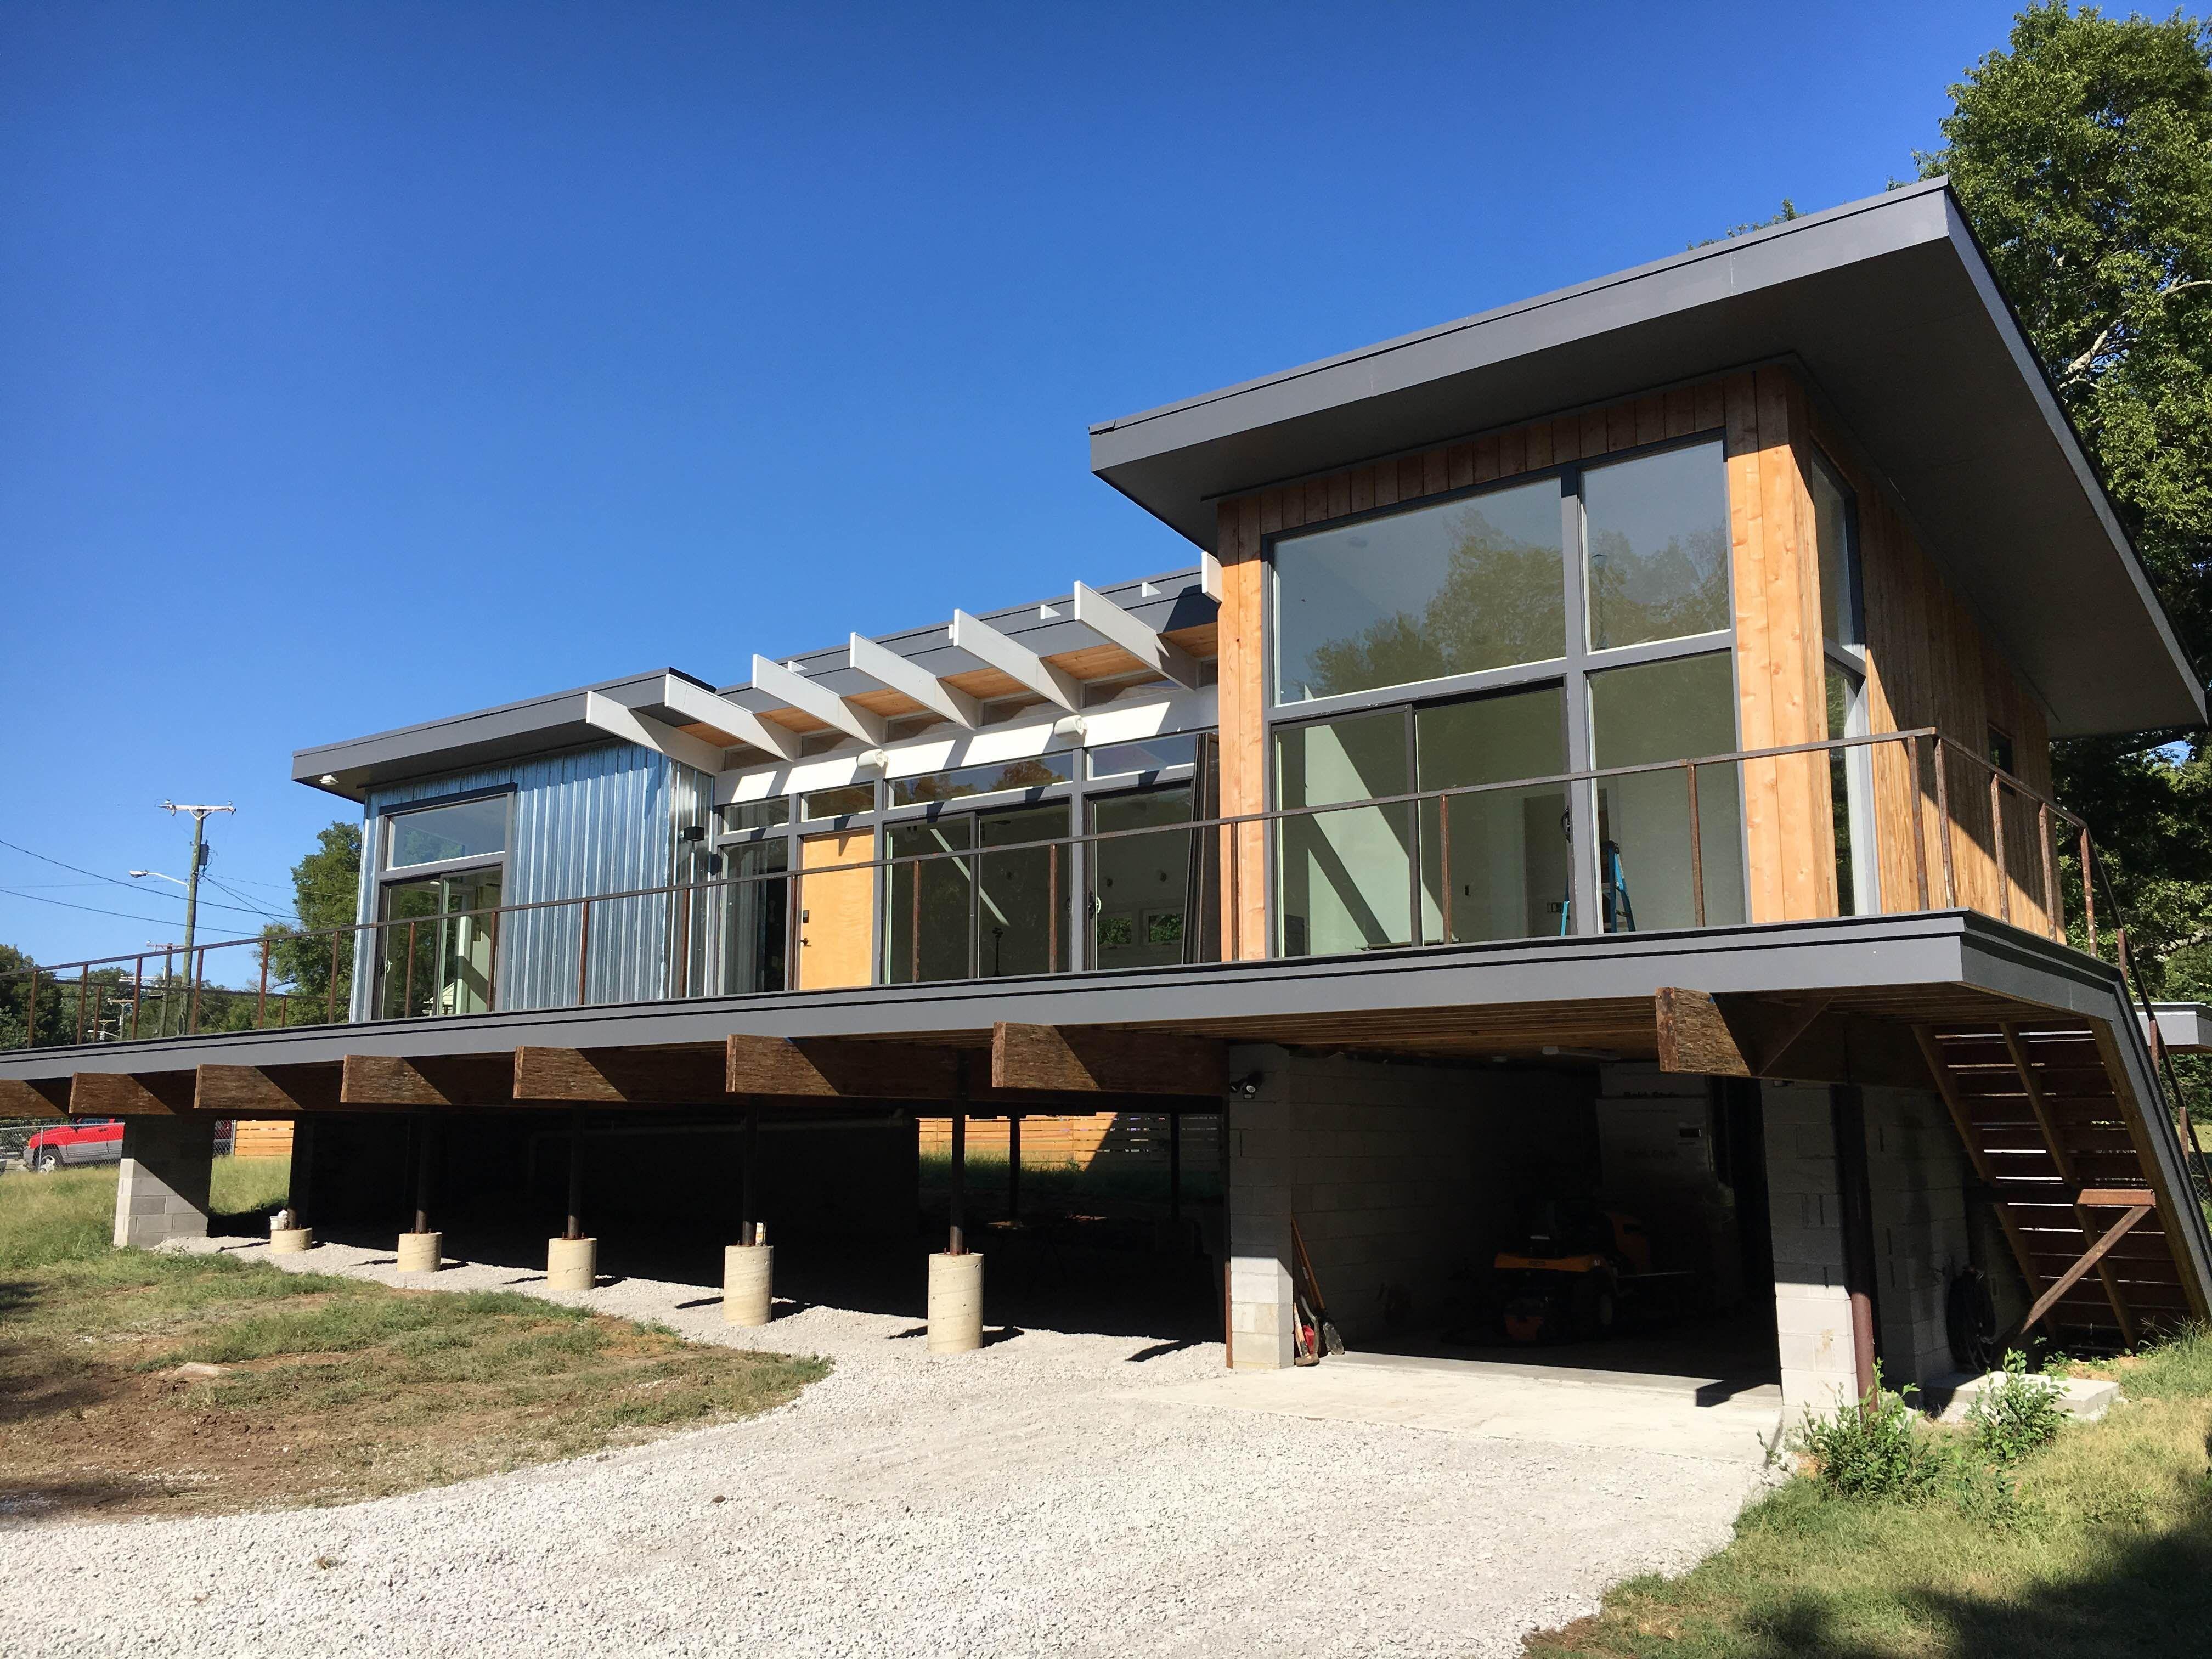 Best Kitchen Gallery: This Wild Idea's Theron Humphrey Builds His New Home In Nashville of Modern Homes Nashville  on rachelxblog.com